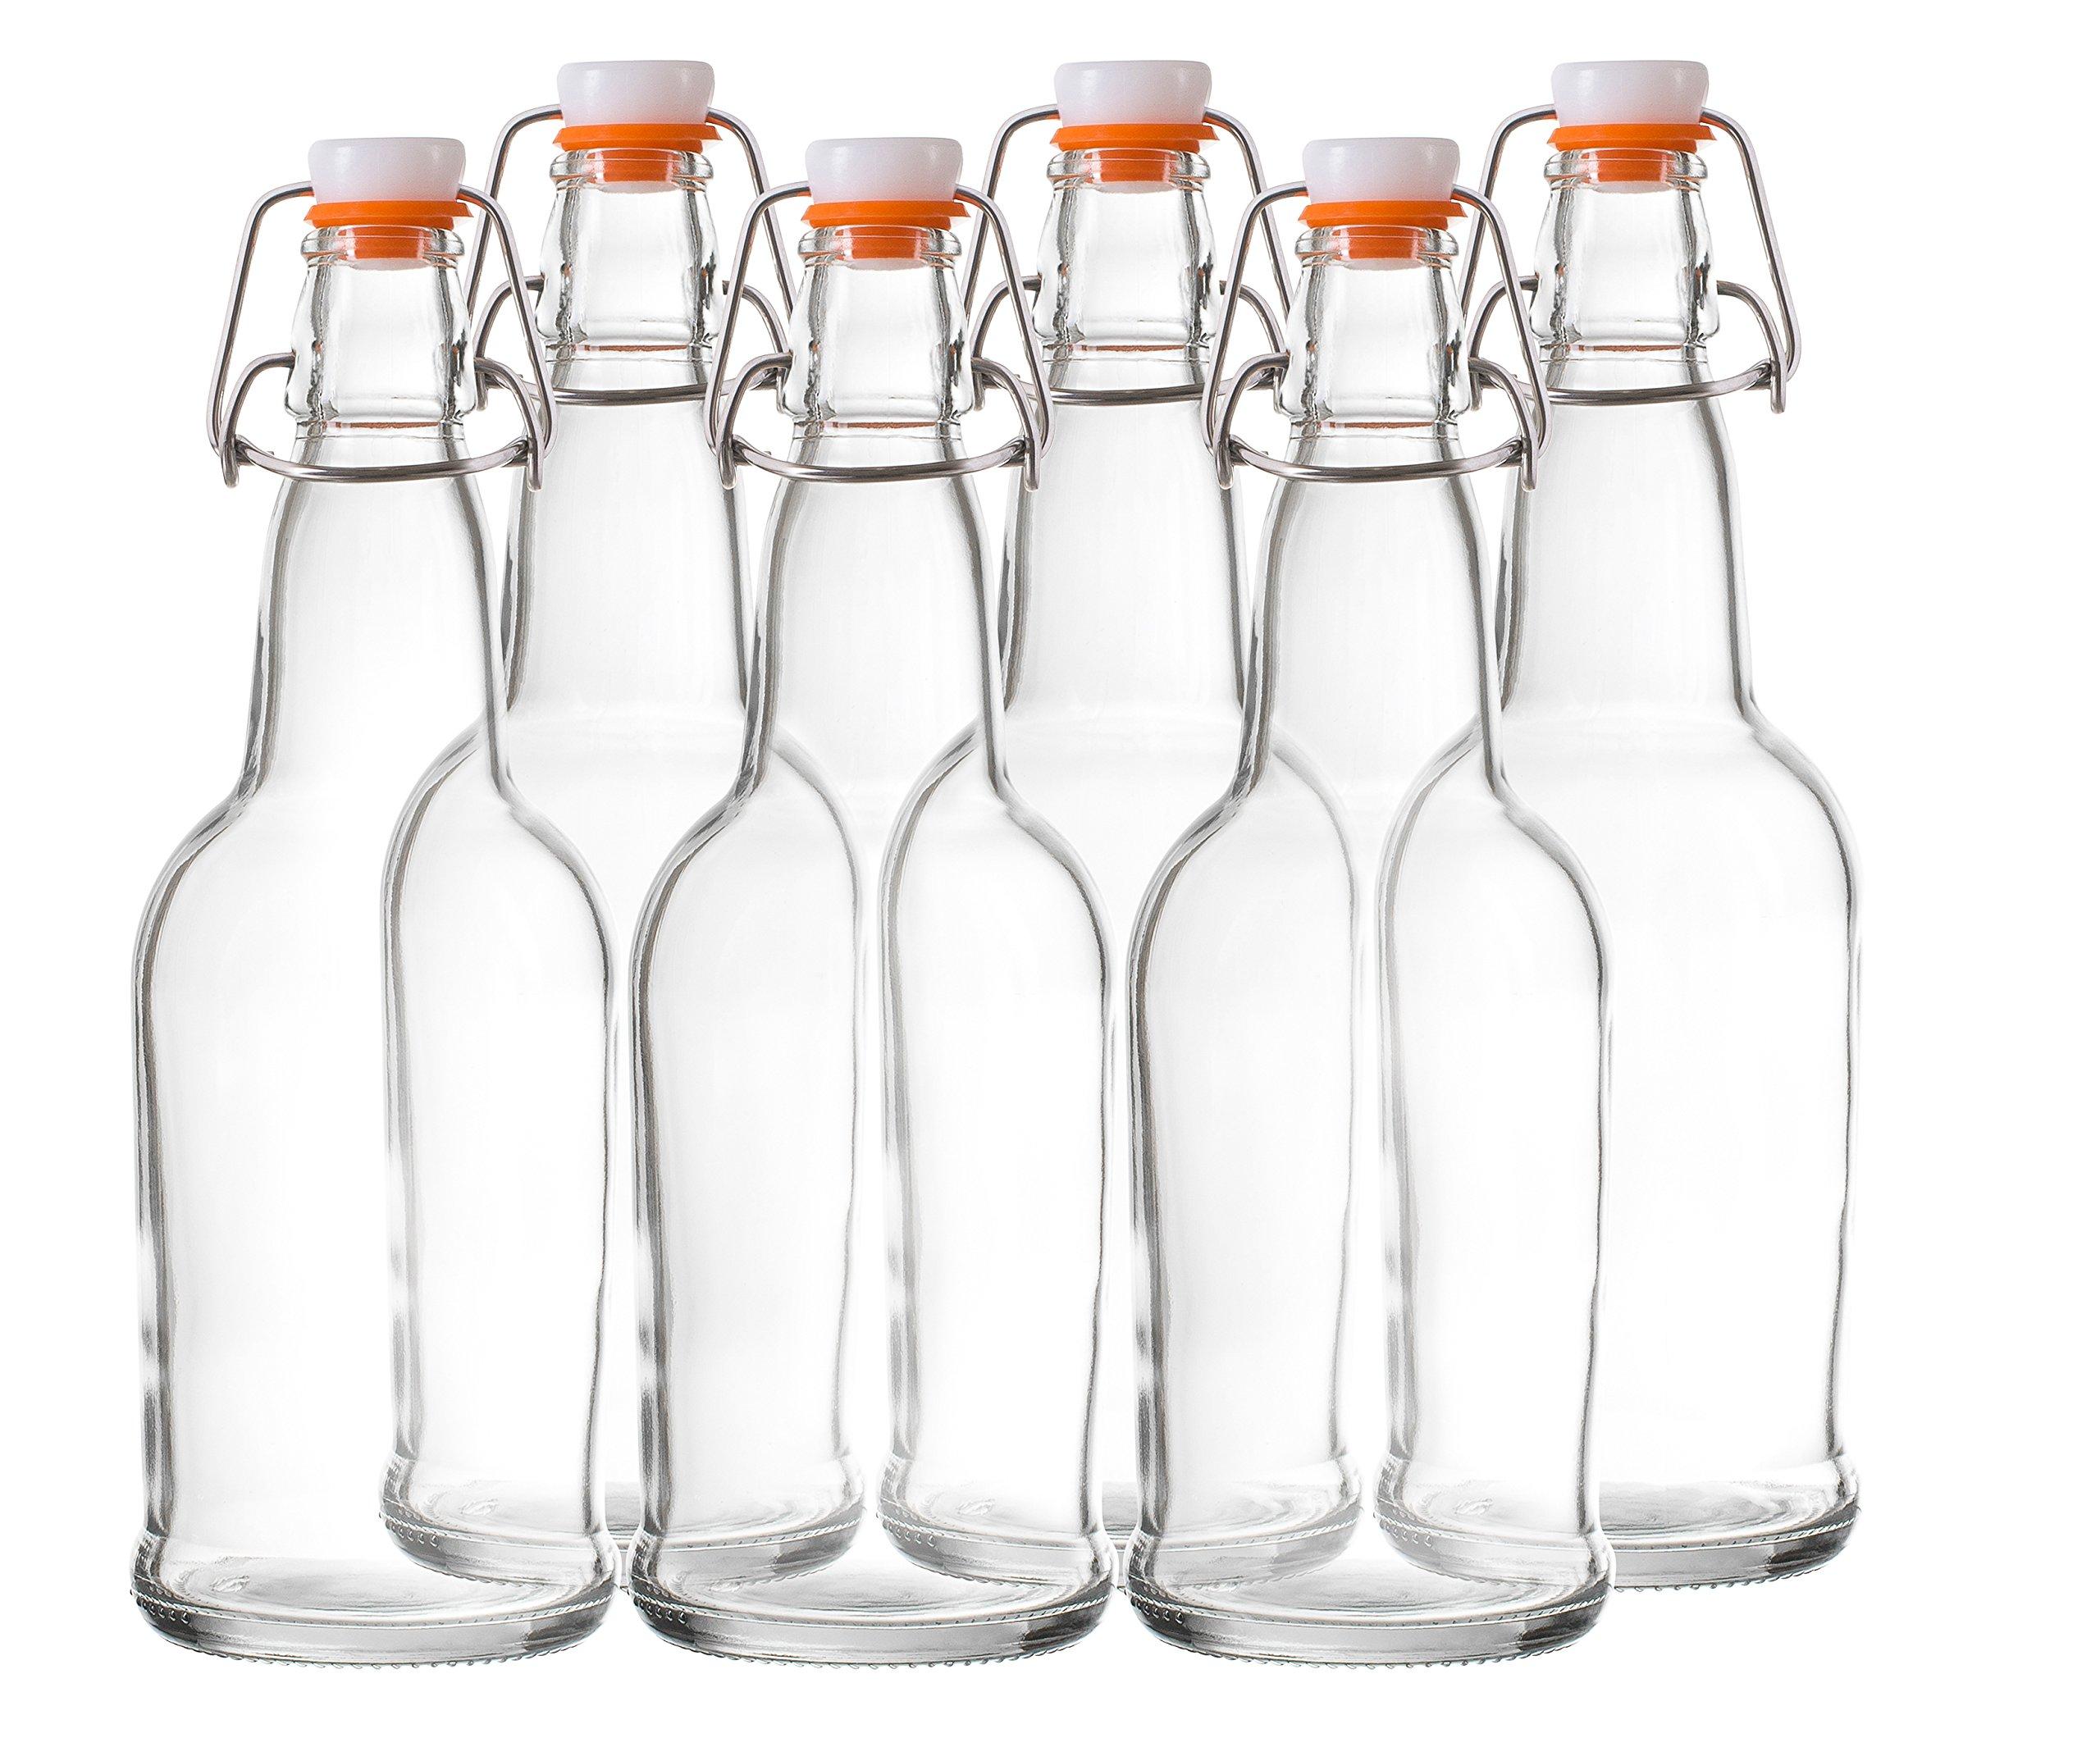 Bellemain Swing Top Grolsch Glass Bottles 16oz - CLEAR - For Brewing Kombucha Kefir Beer (6 Set) by Bellemain